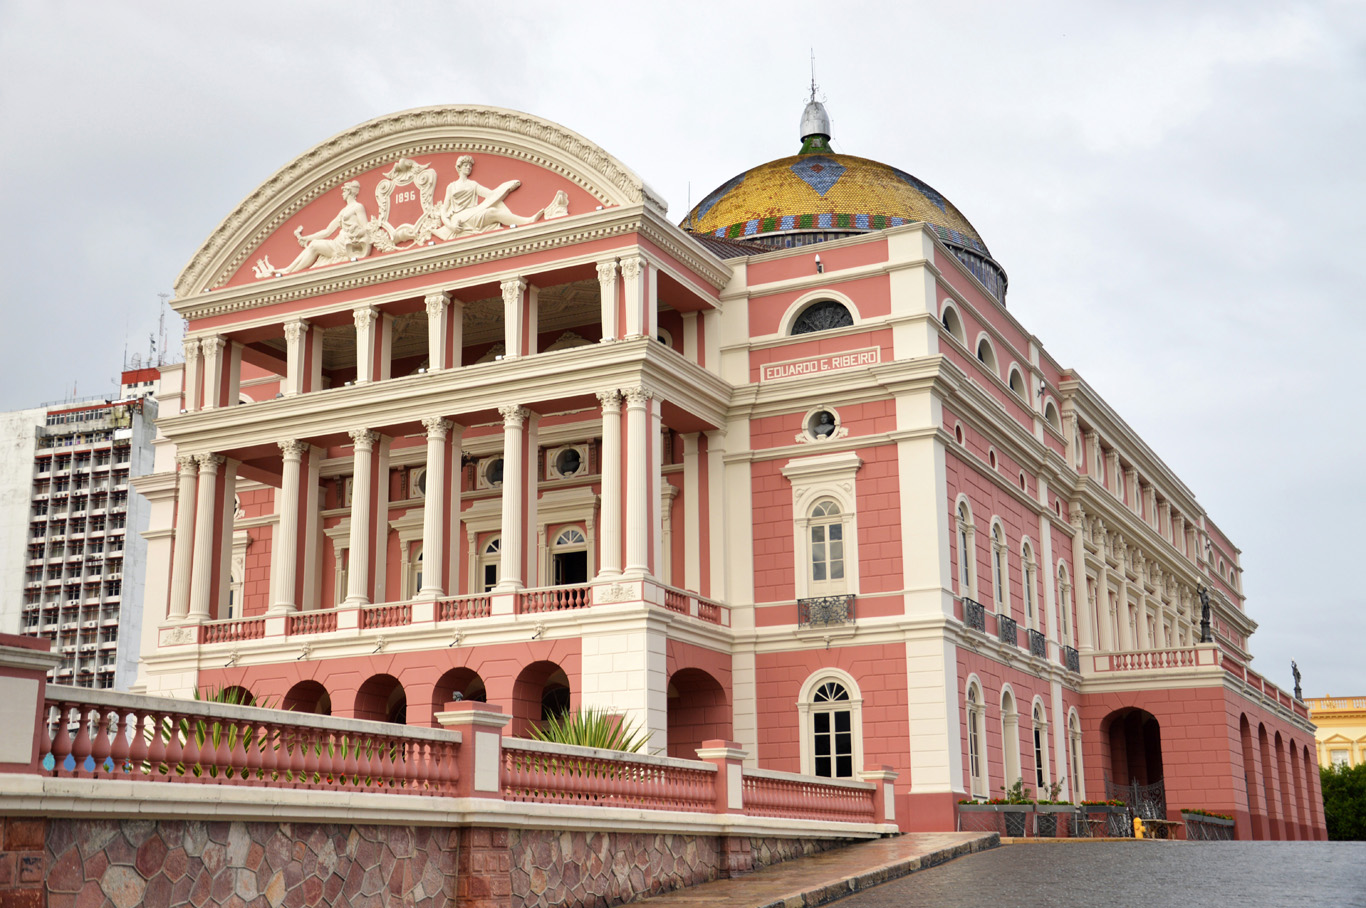 The Amazonas Theater